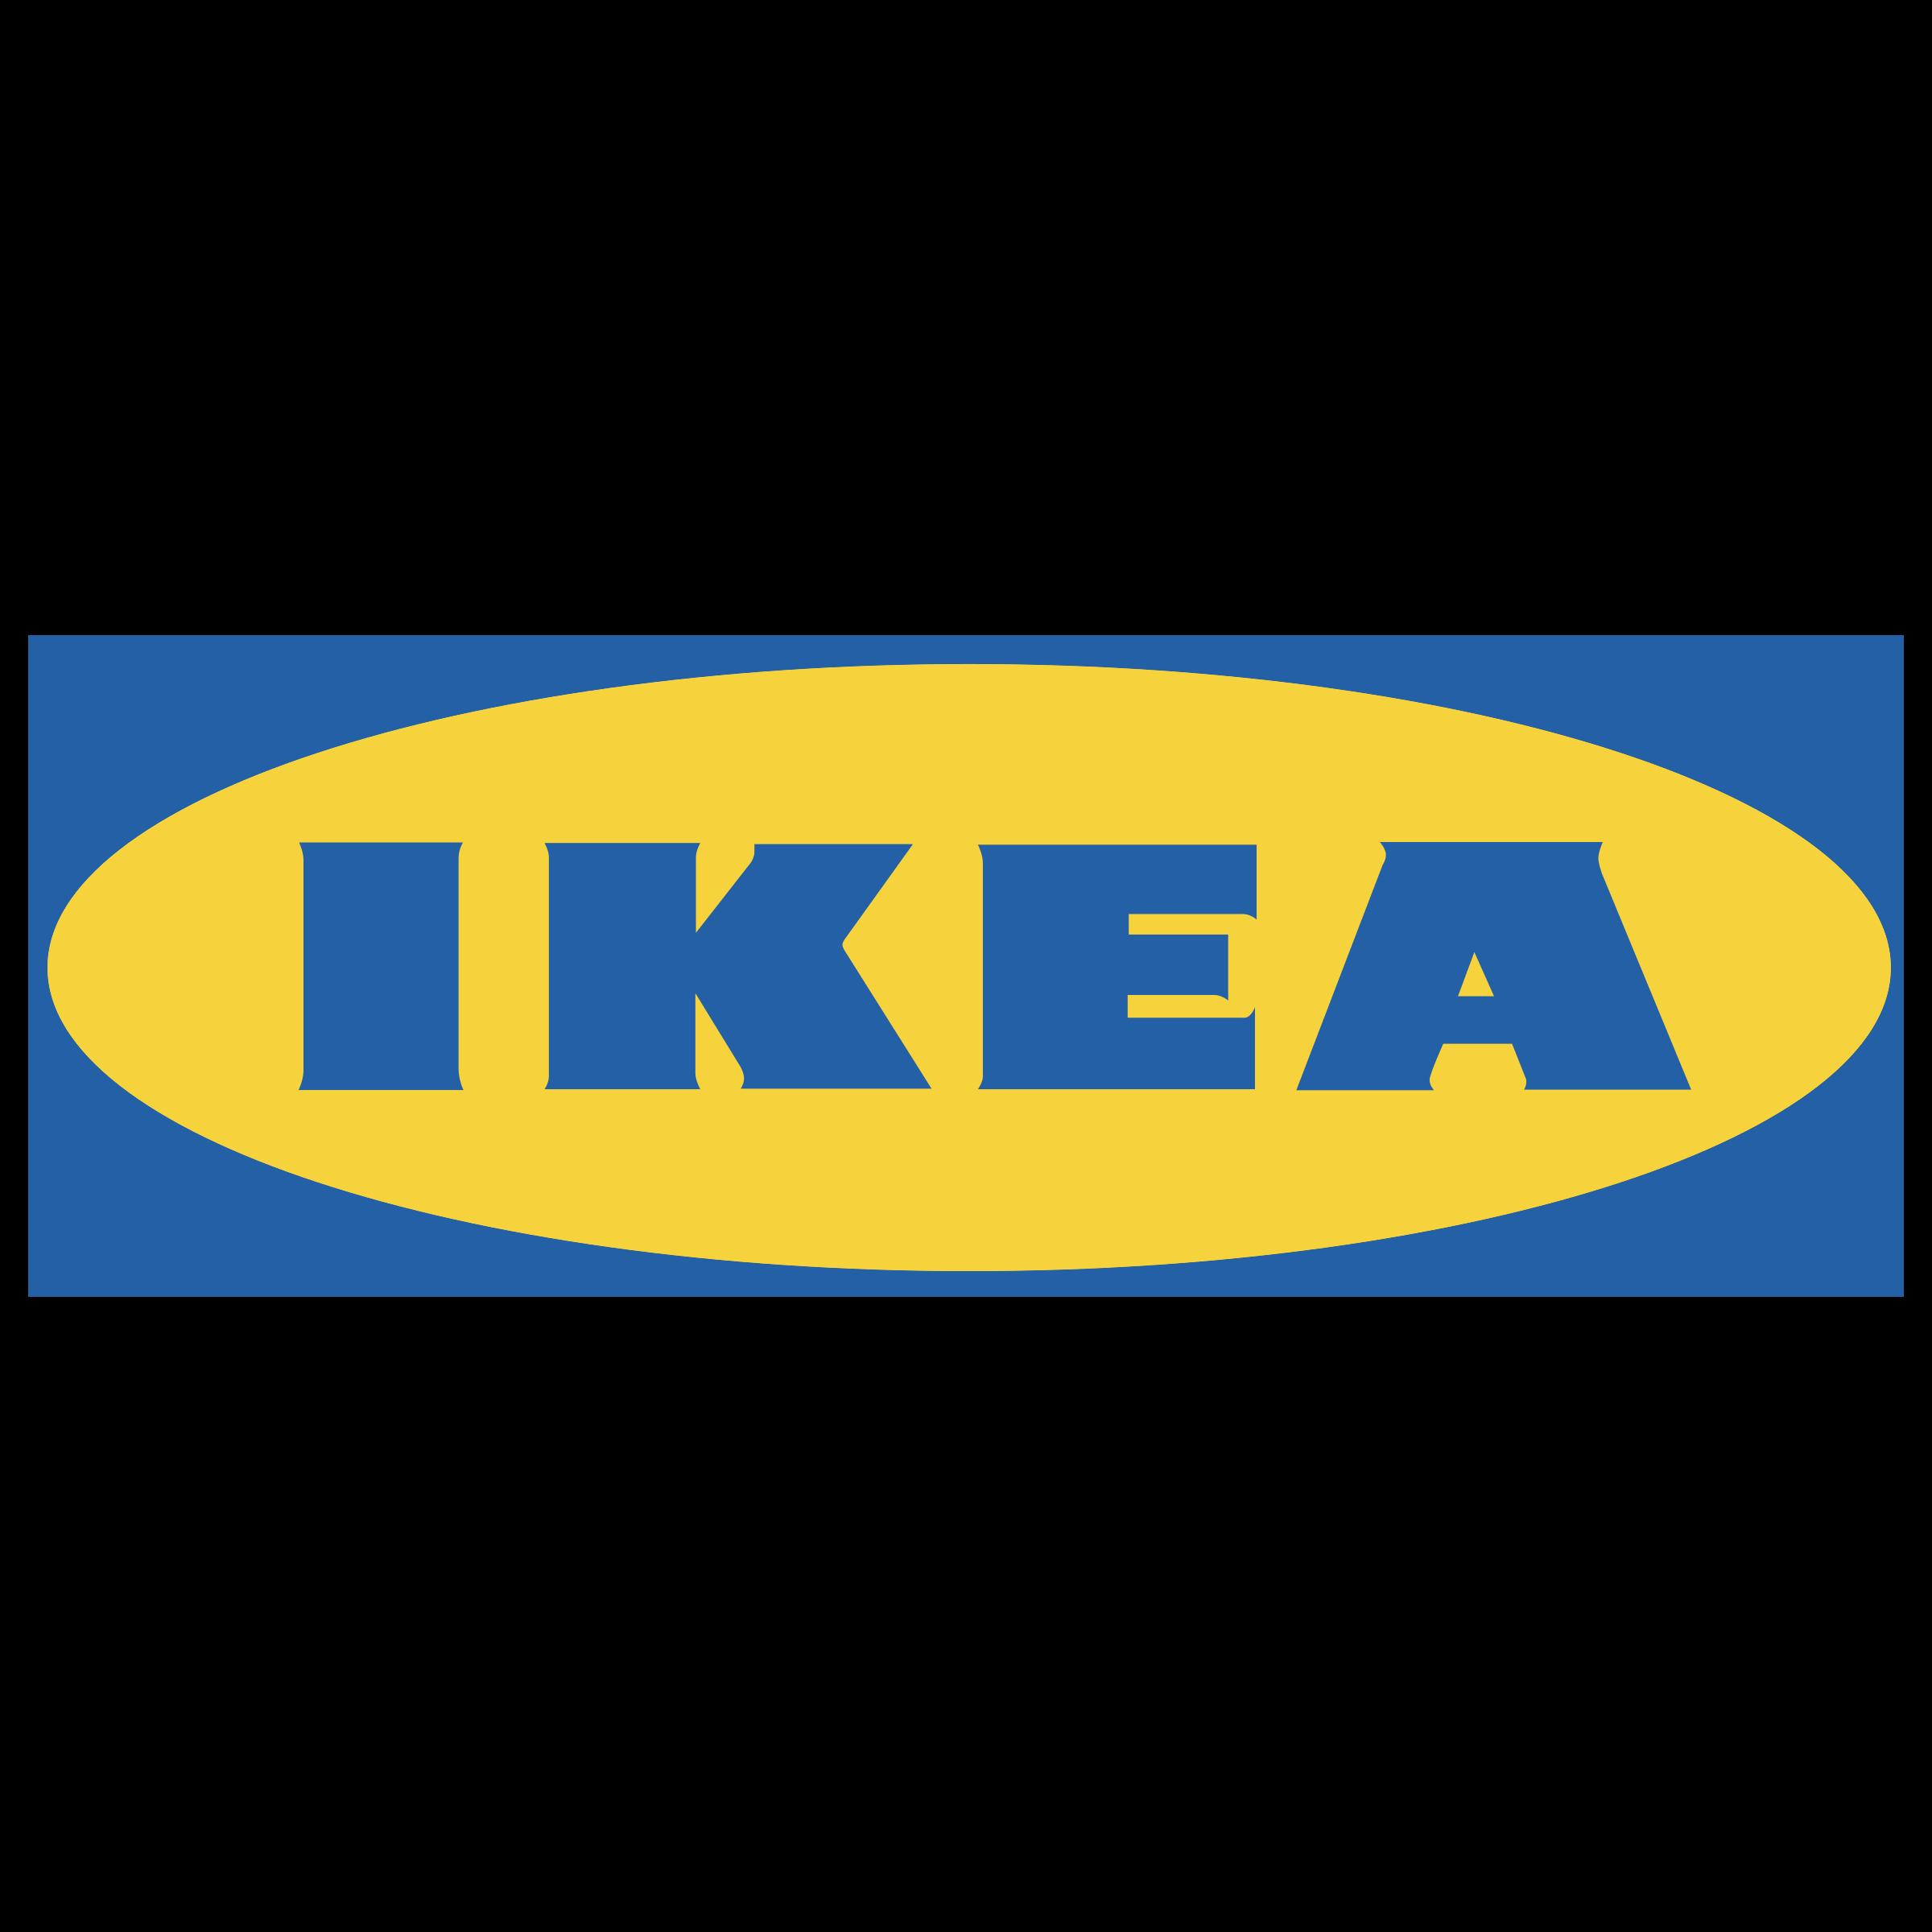 Ikea Logo Eps Png Transparent Ikea Logo Eps.png Images. | Pluspng - Ikea Logo PNG